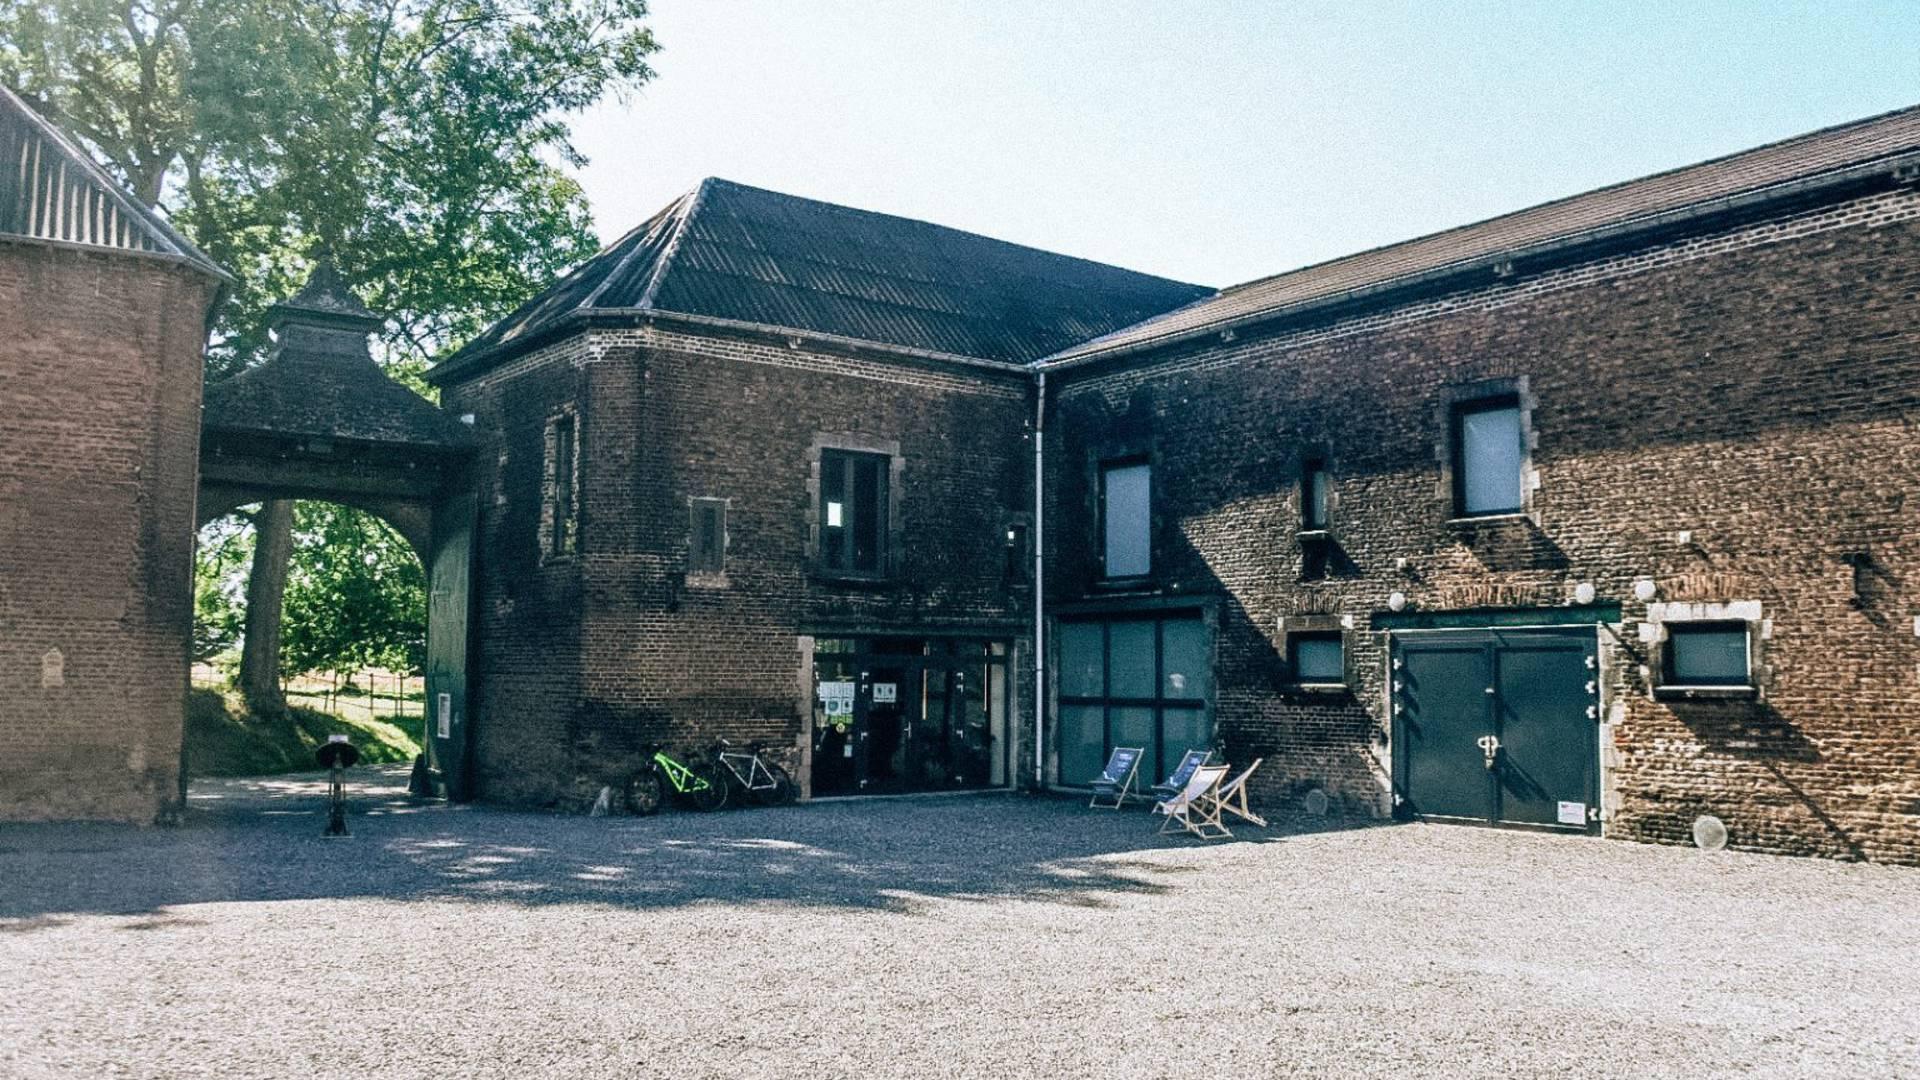 Ferme accueillant la distillerie Belgian Owl